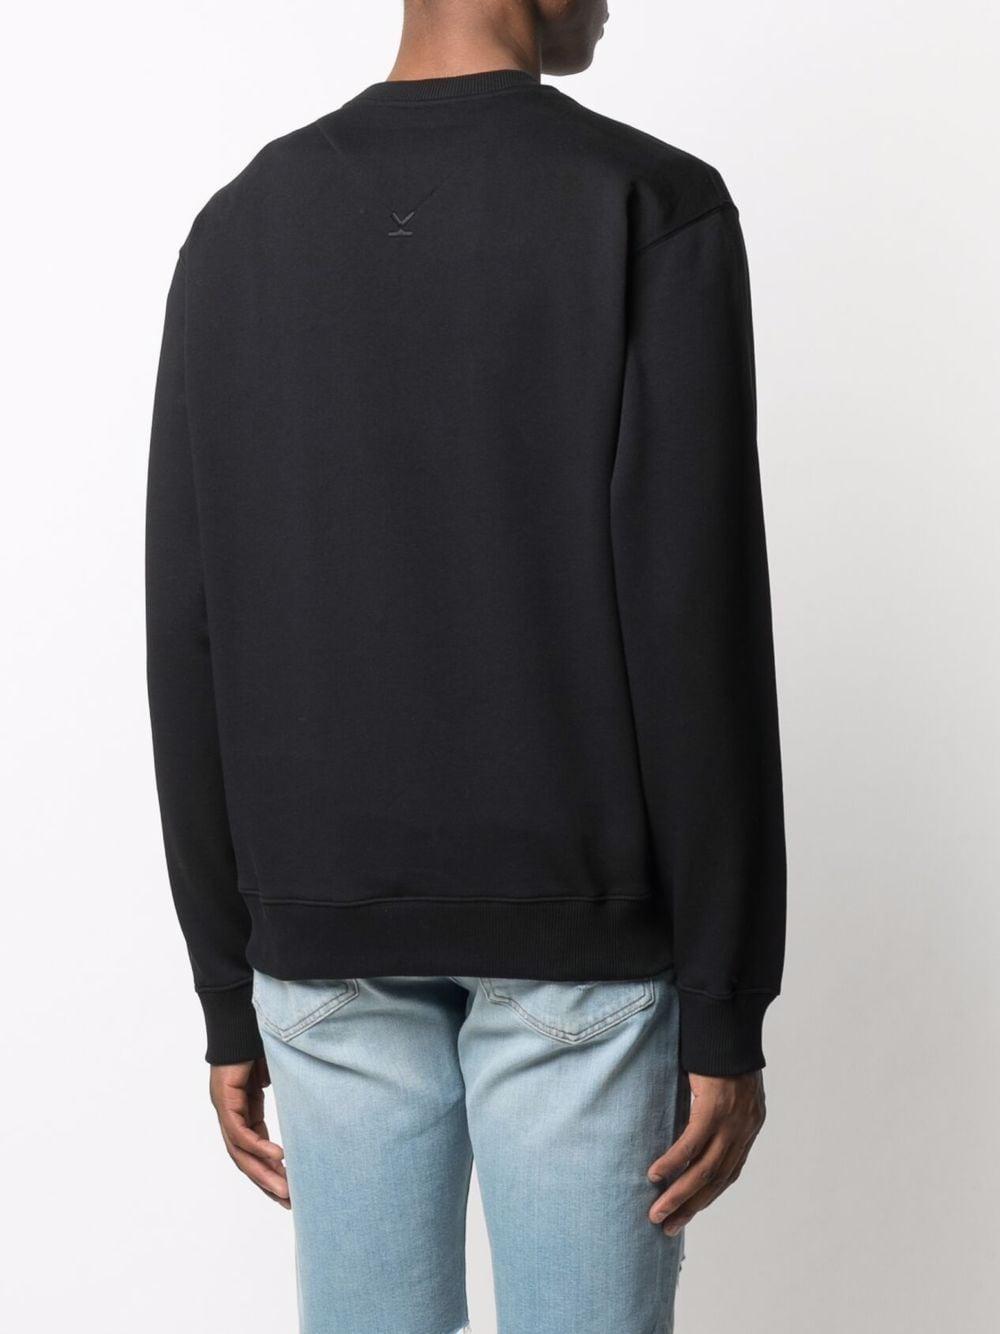 felpa con logo uomo nera in cotone KENZO | Felpe | FB65SW0004ML99